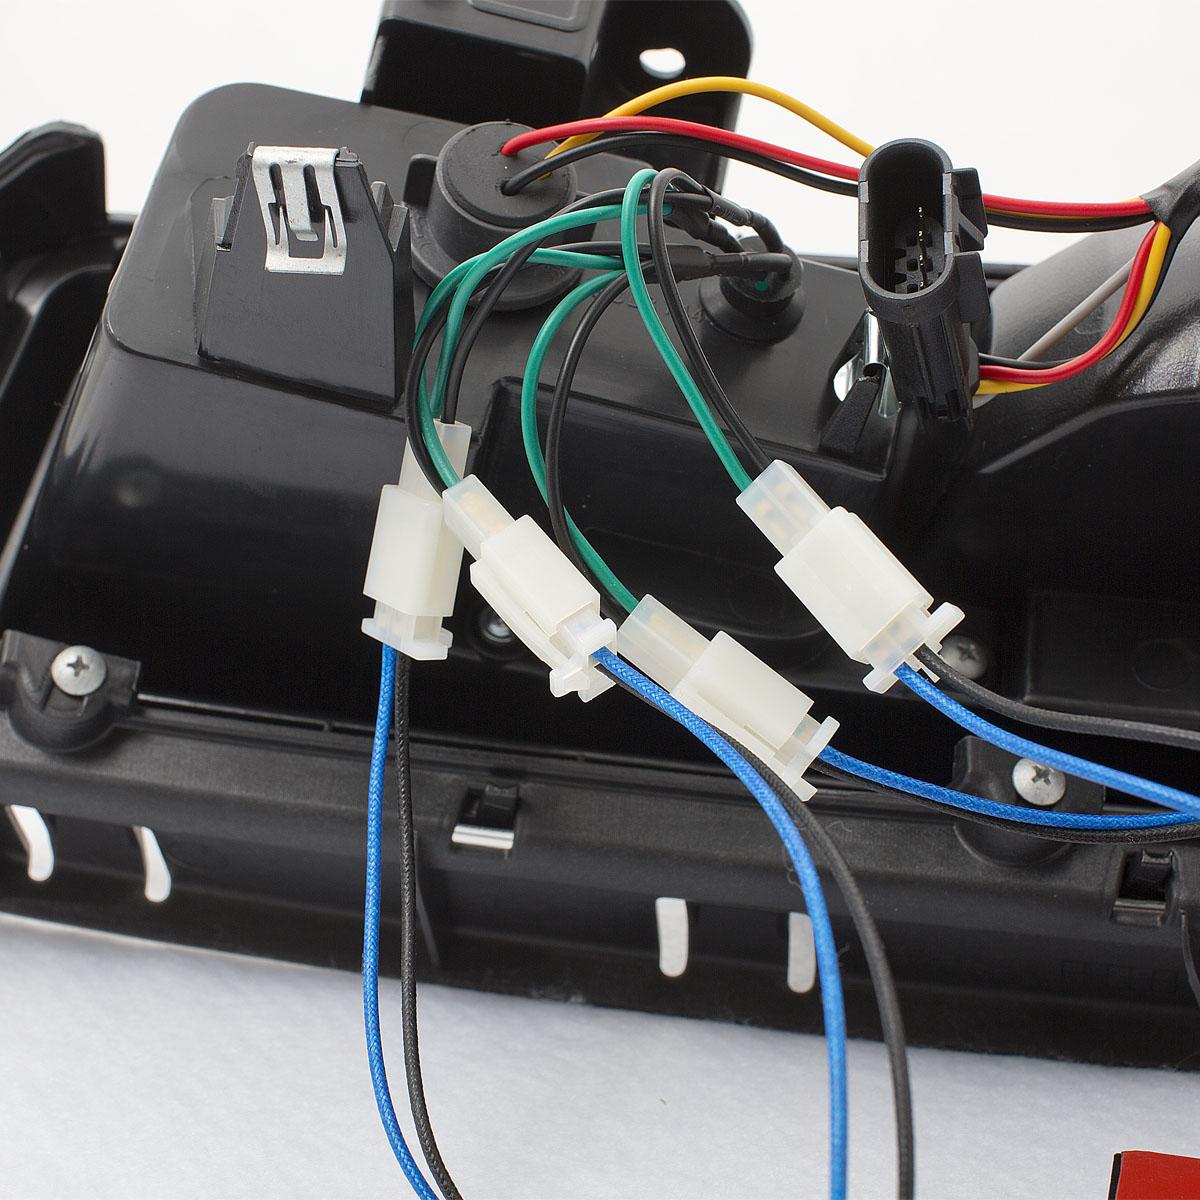 2014 2015 Chevy Camaro Led Black Rear Brake Tail Lights Lamps Pair Gmc Light Wiring Ebay